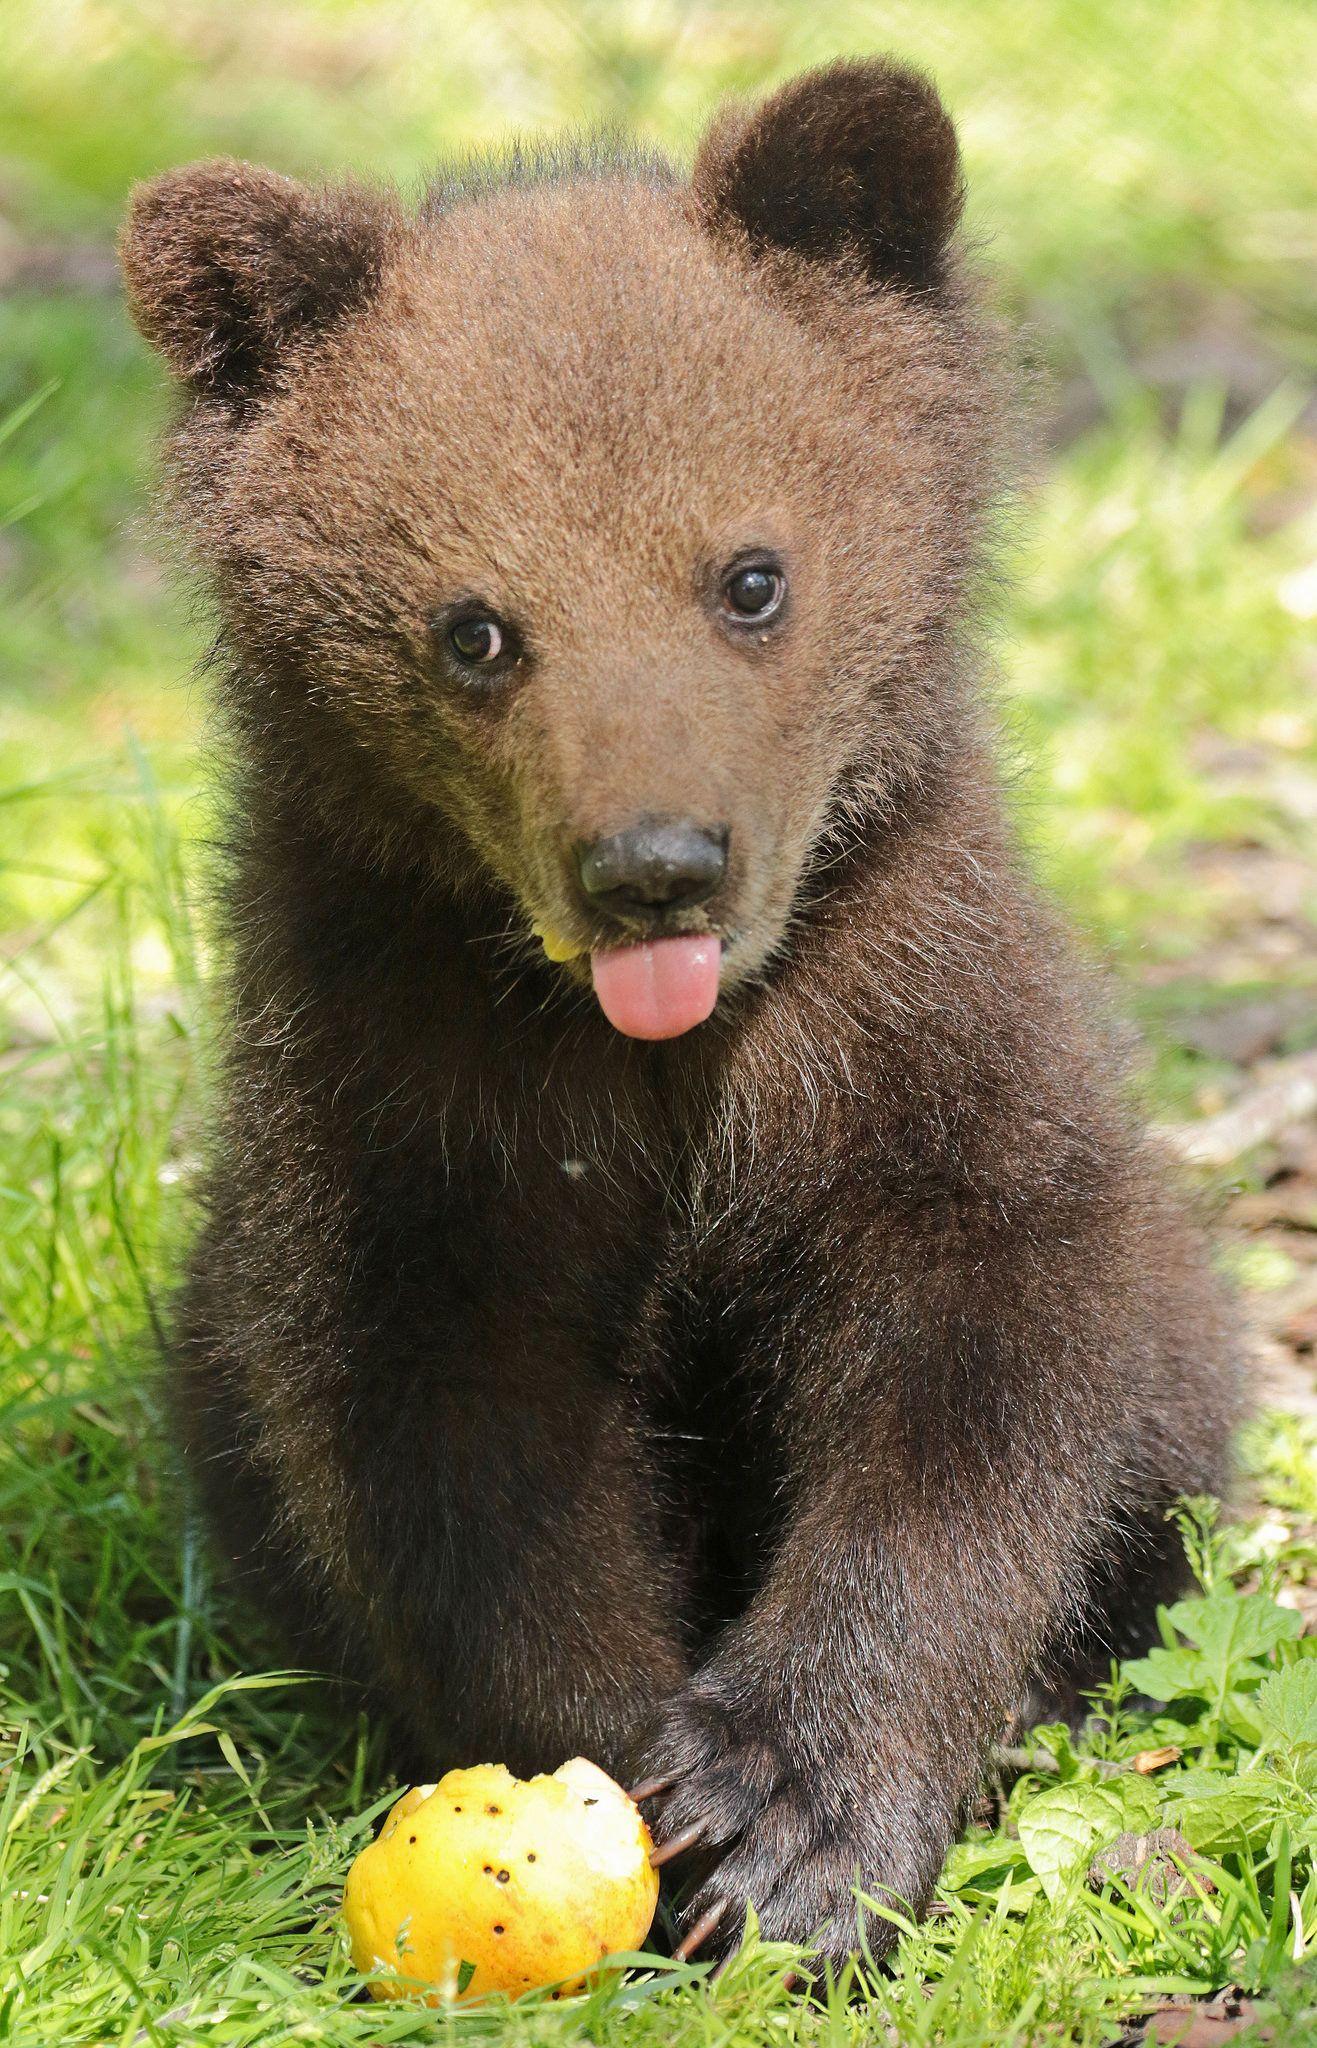 Bear cub sticks his tongue out.